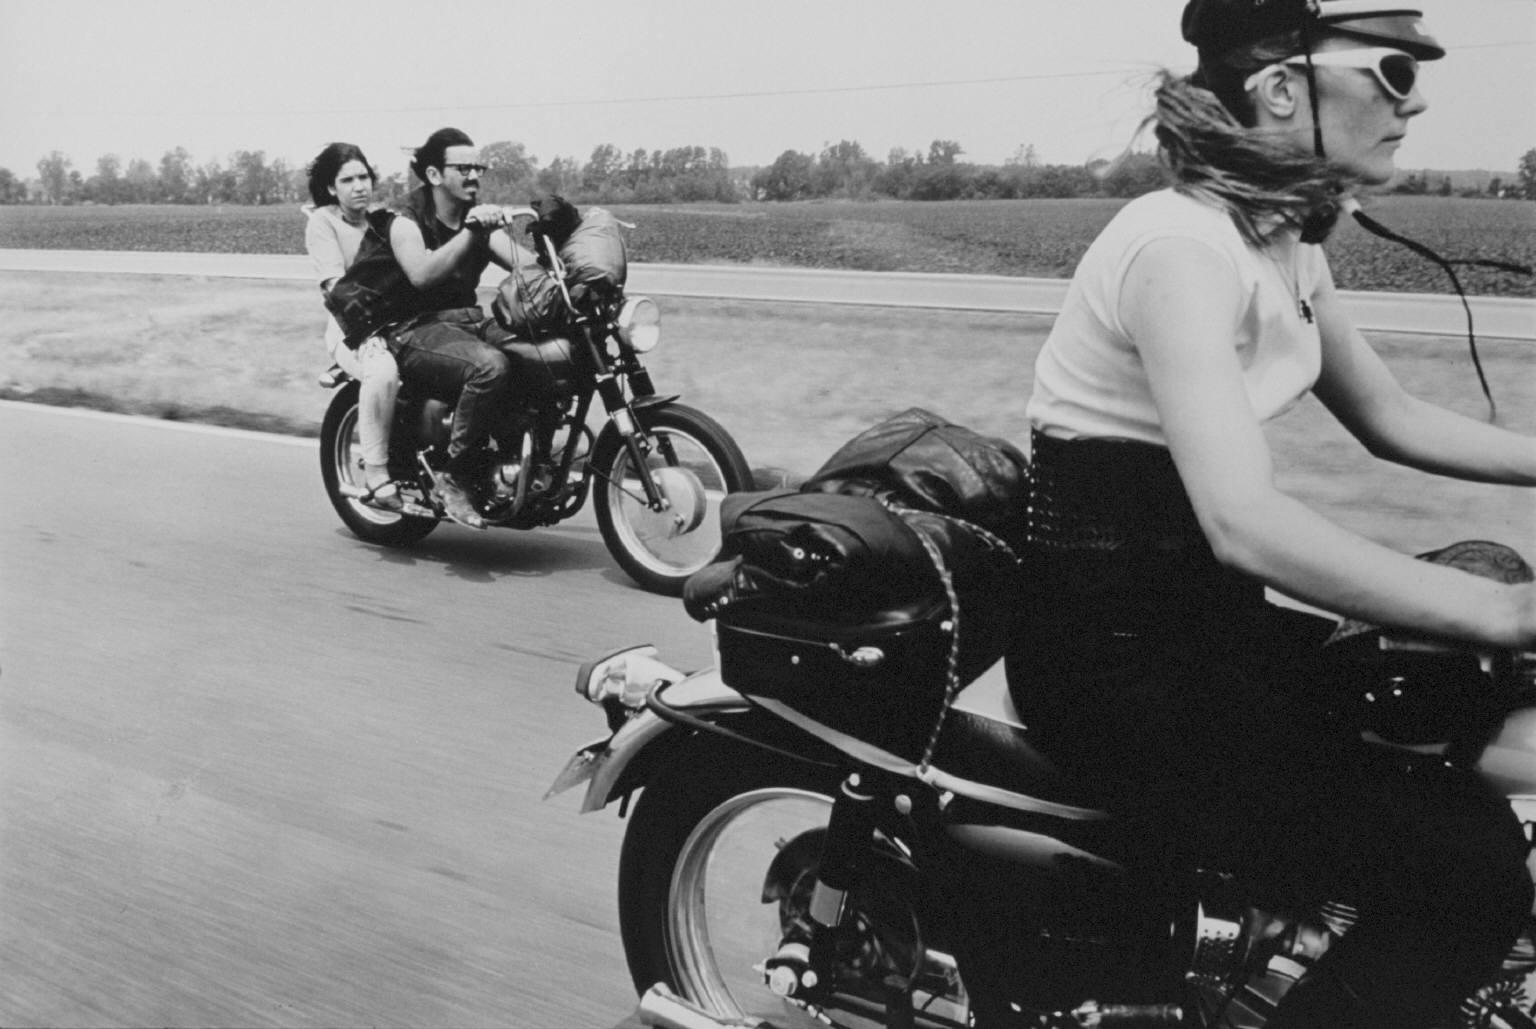 From Dayton to Columbus, Ohio Motorbike photography Danny Lyon